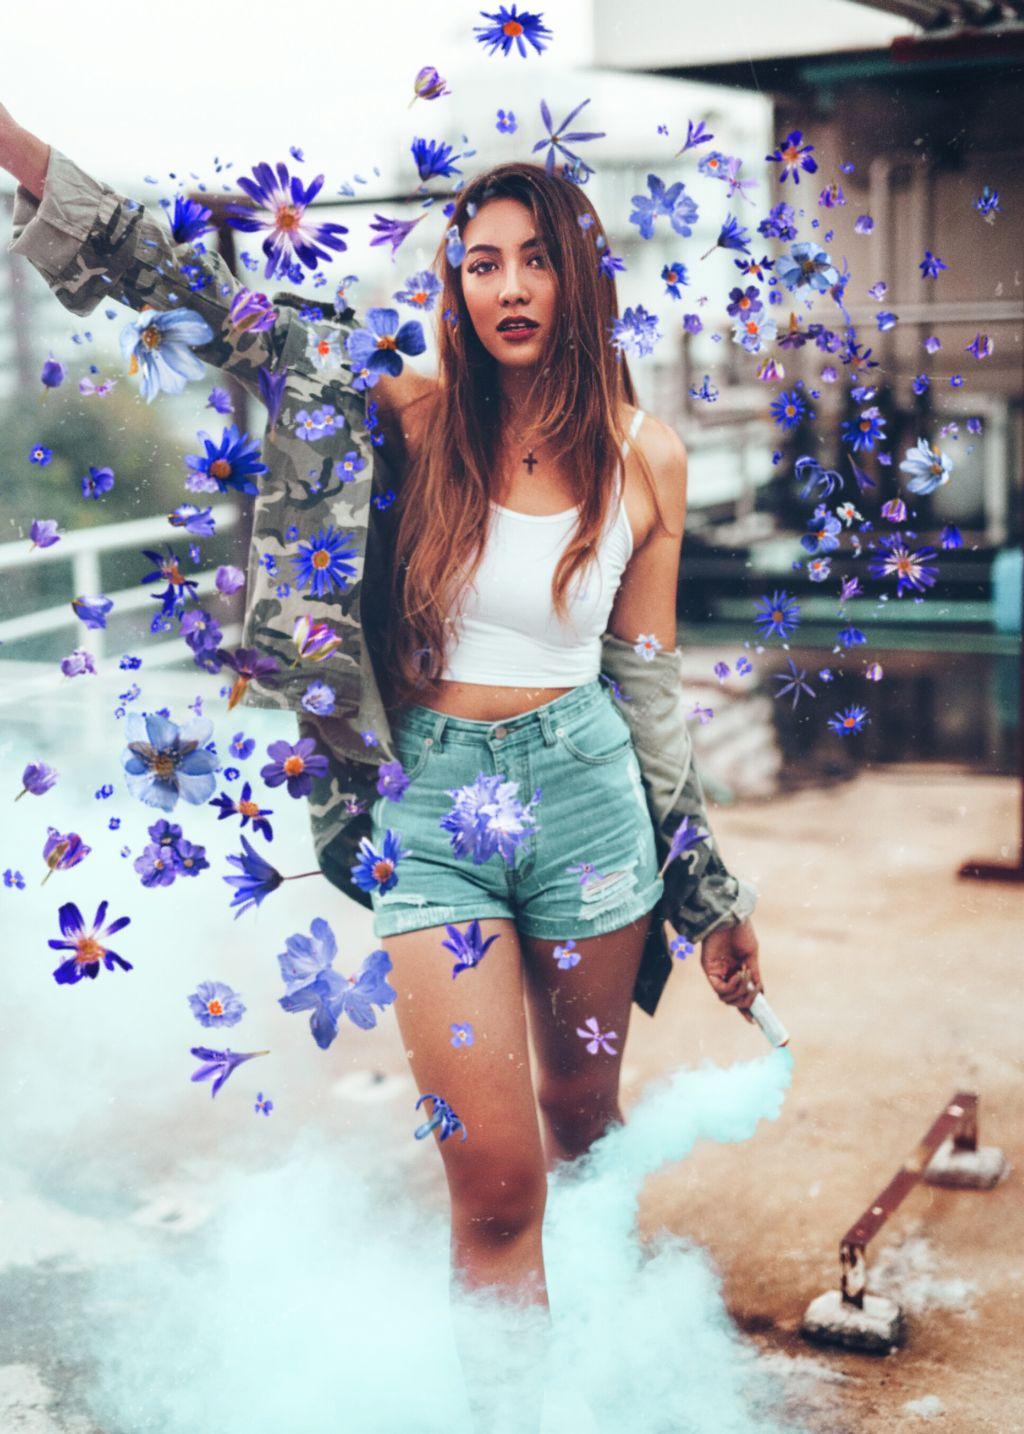 #freetoedit #girl #purple